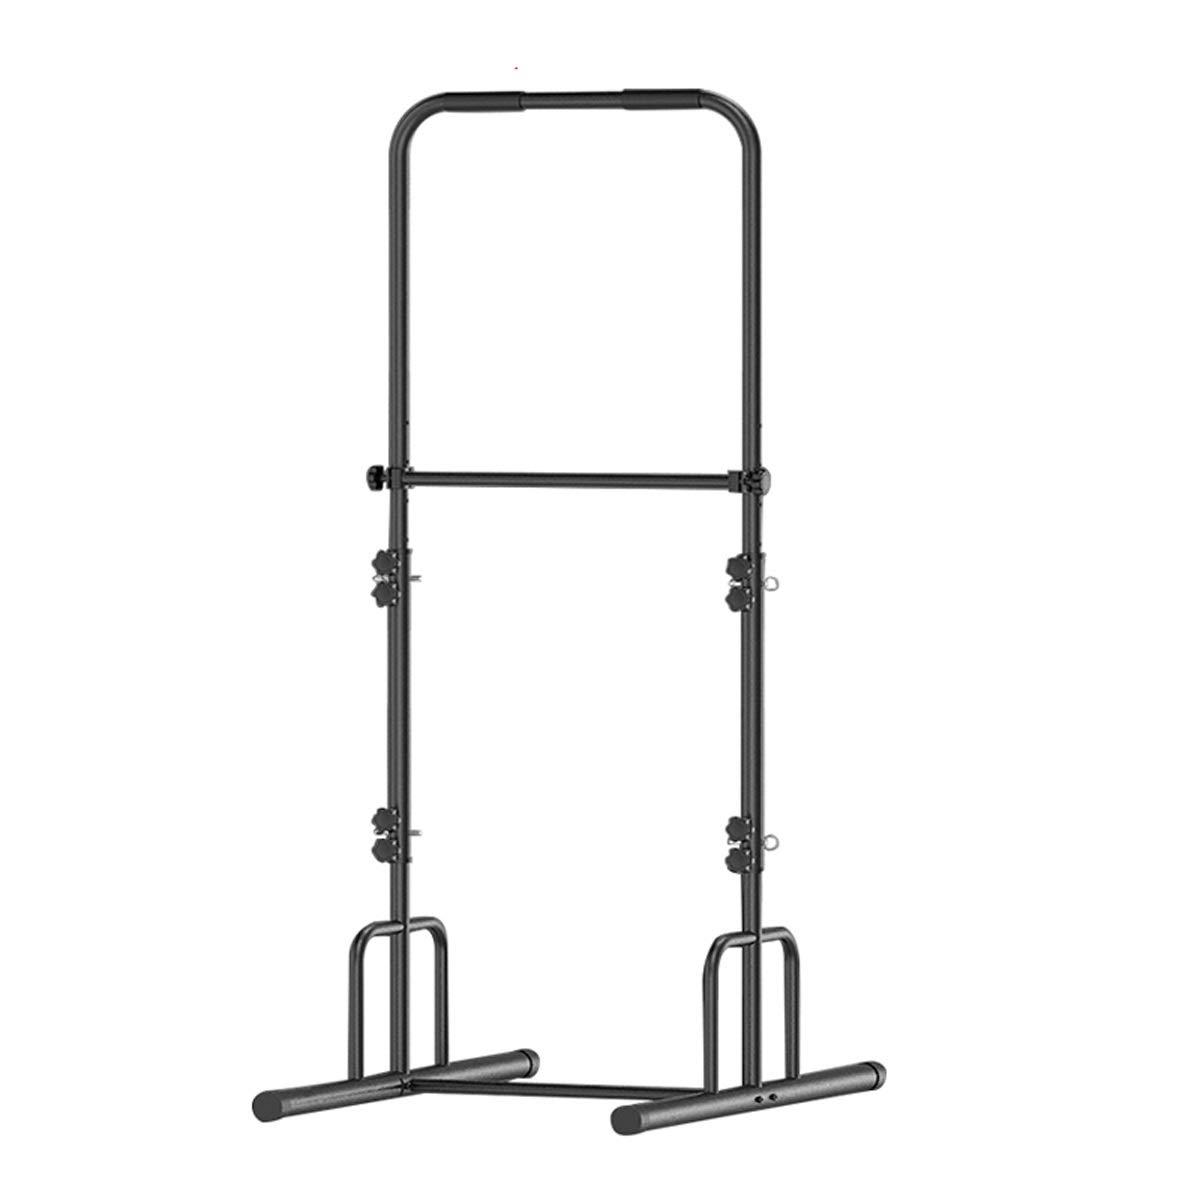 Pull-ups Horizontal Bar Parallel Bars Indoor Multi-Functional Fitness Equipment